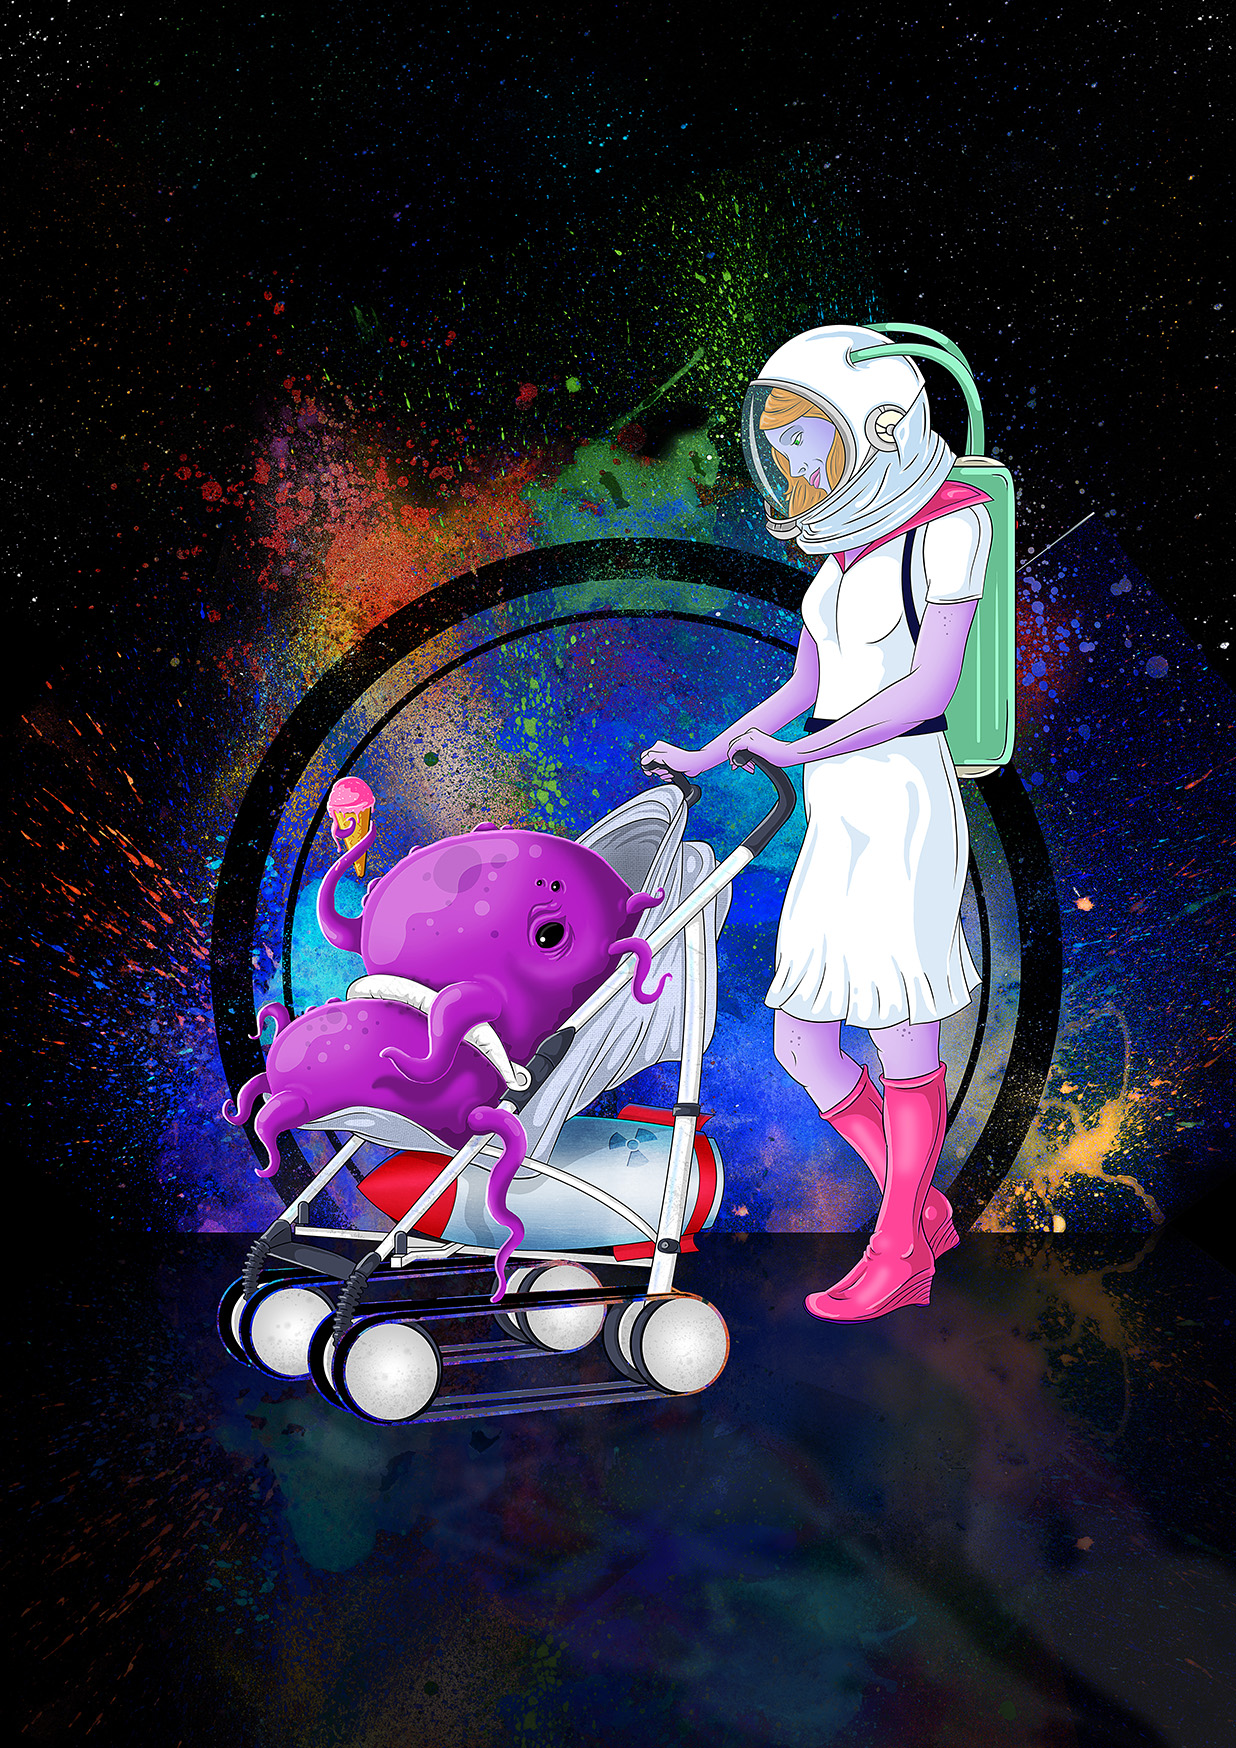 Digital art. Digital painting. Drawing. Illustration. Sci-Fi. Space art.